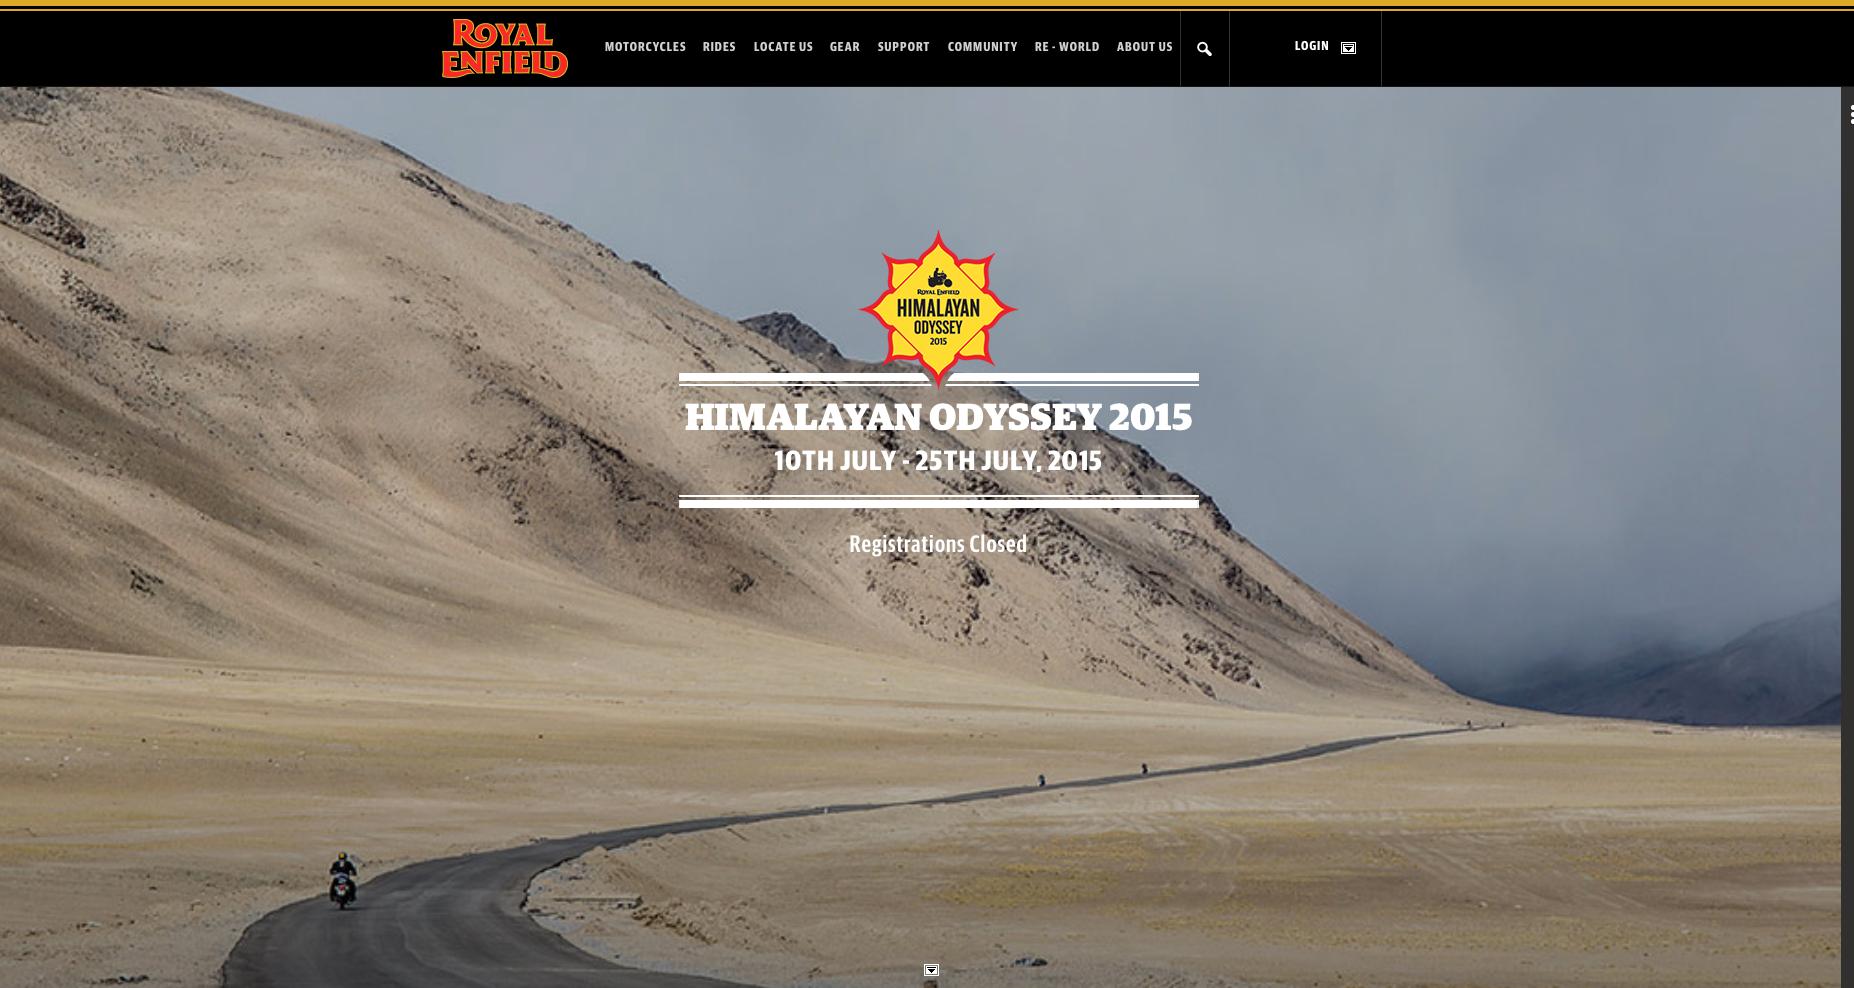 Royal Enfield - Himalayan Odyssey